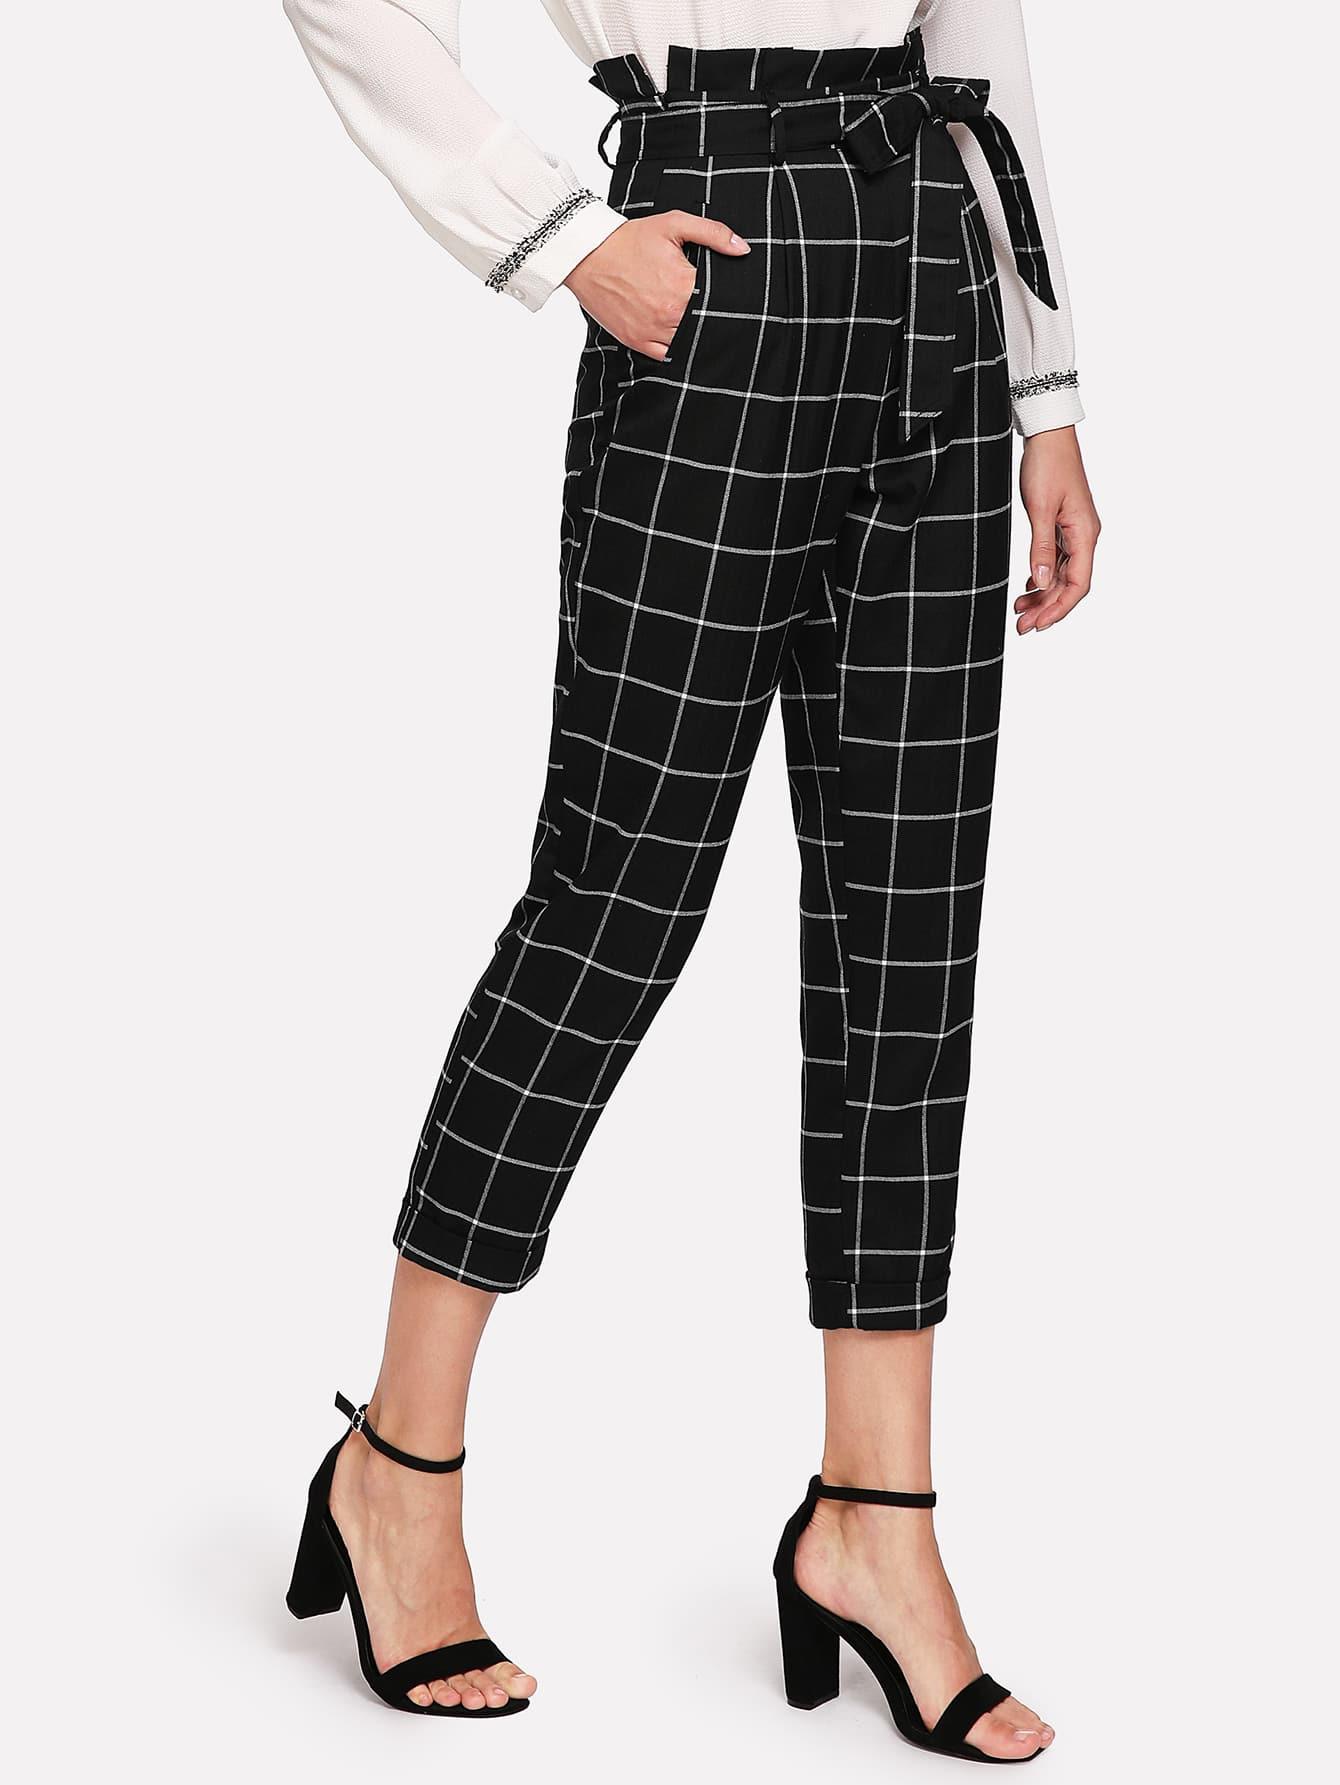 Self Belted Frilled Waist Grid Pants ruffle waist belted peg pants